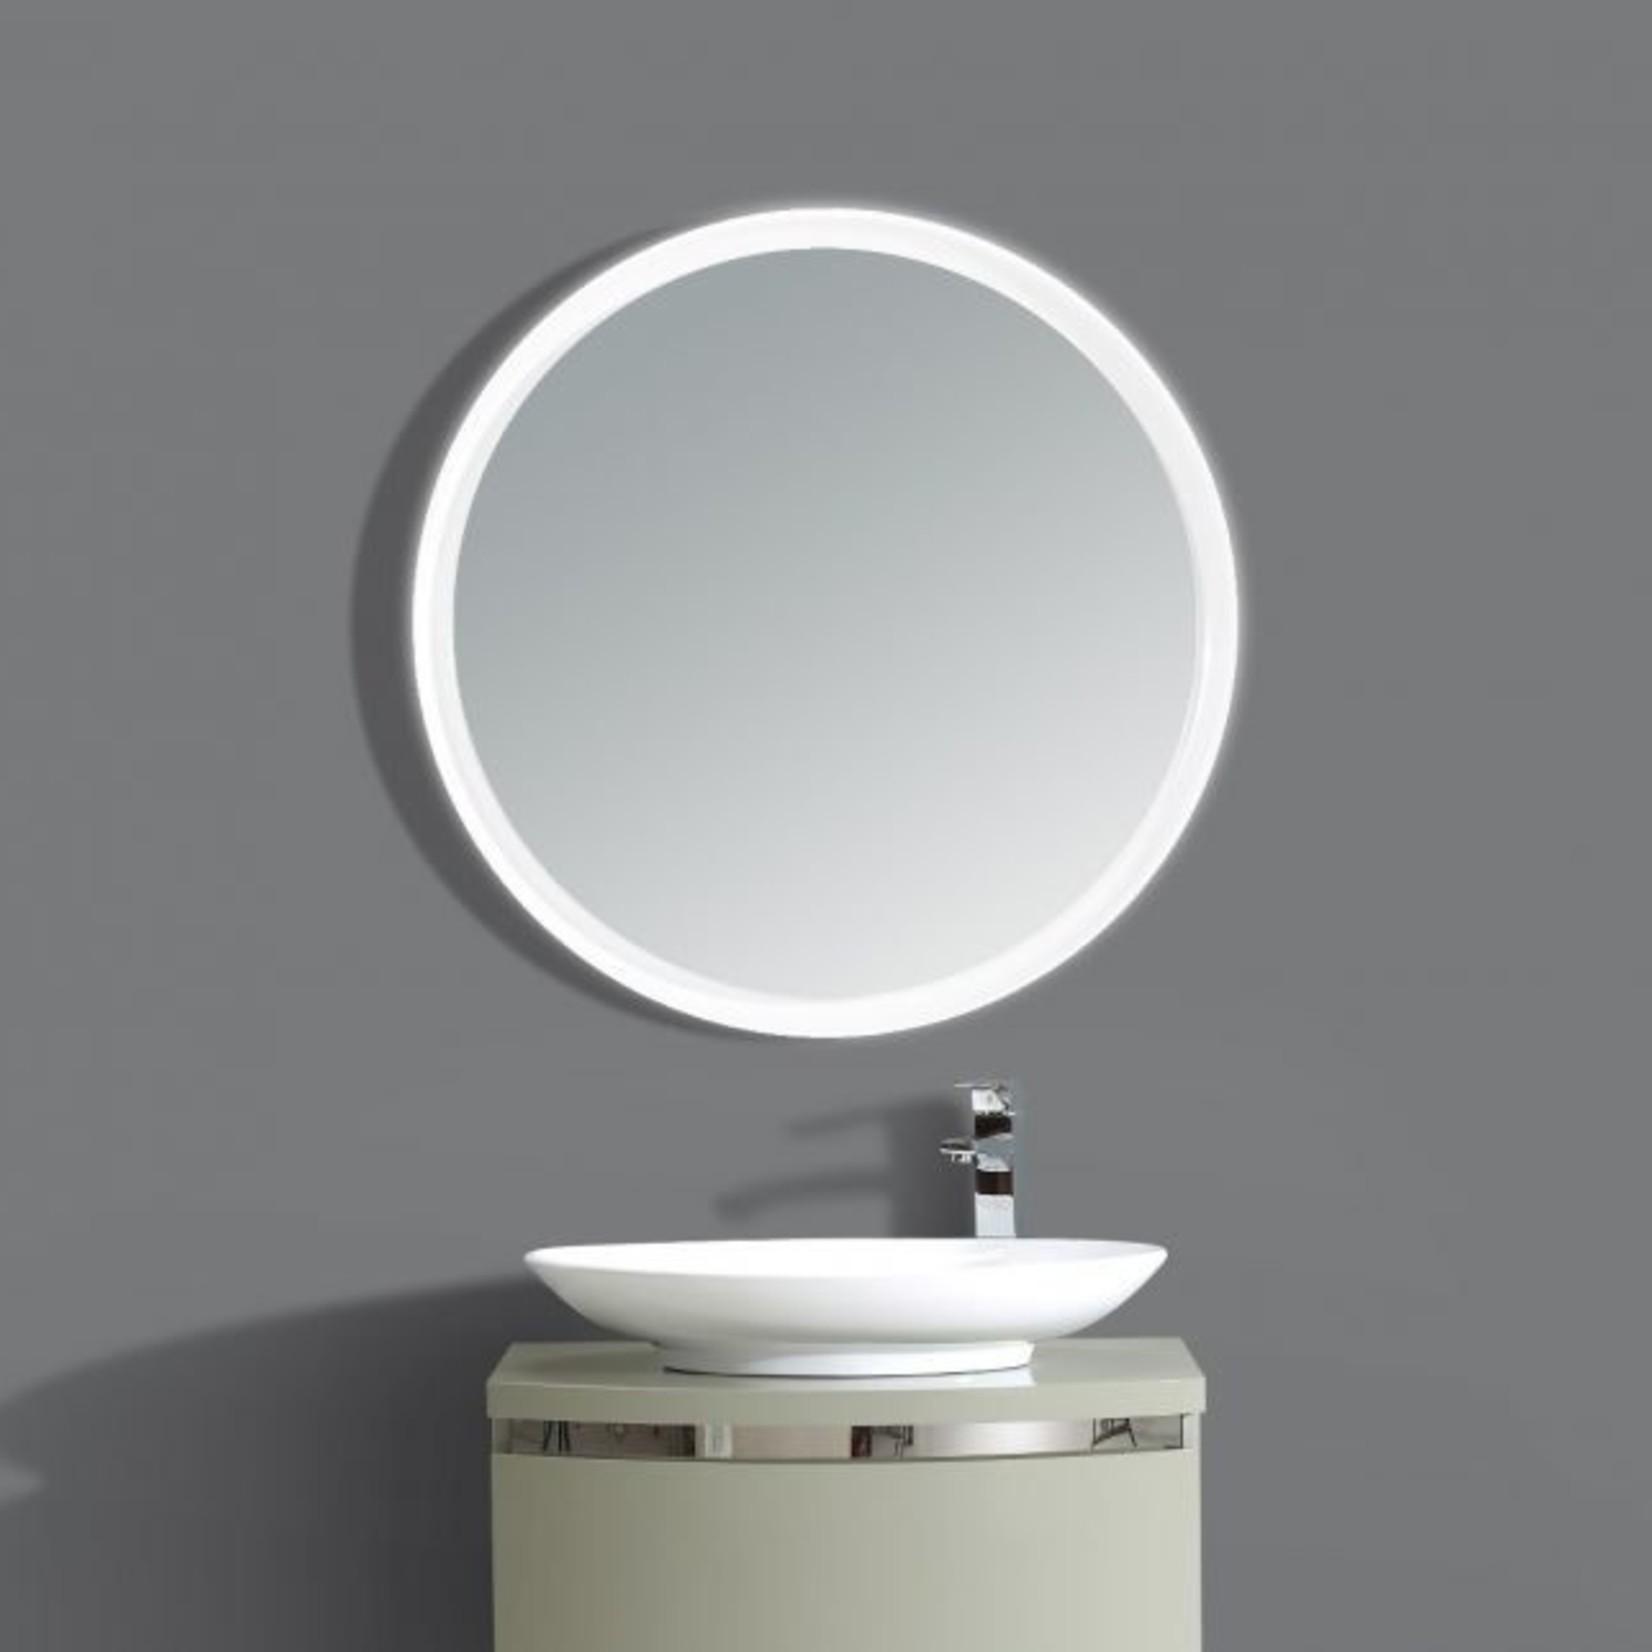 Led mirror 31 '' Aries Ove